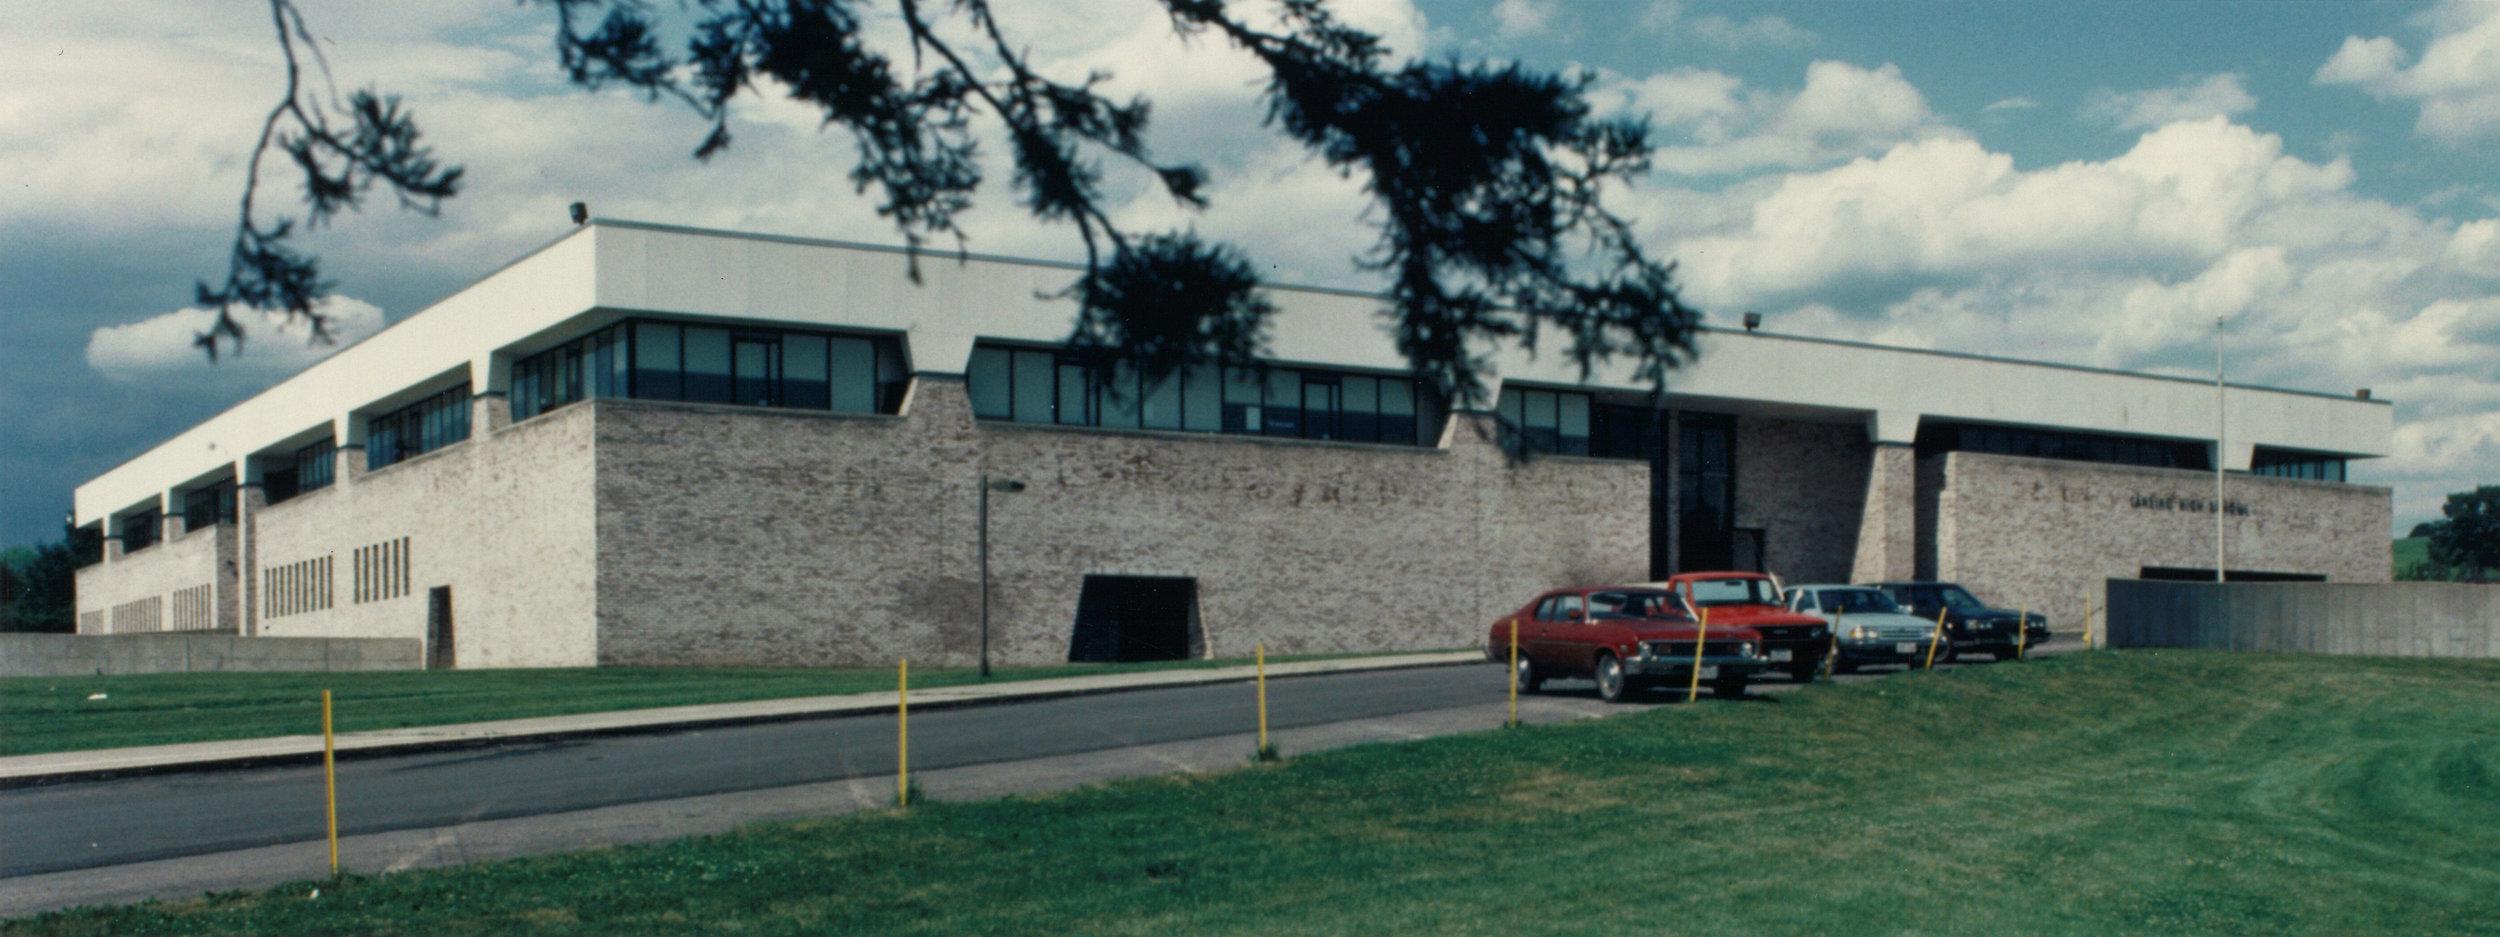 Lansing Central School District  - Lansing, NY